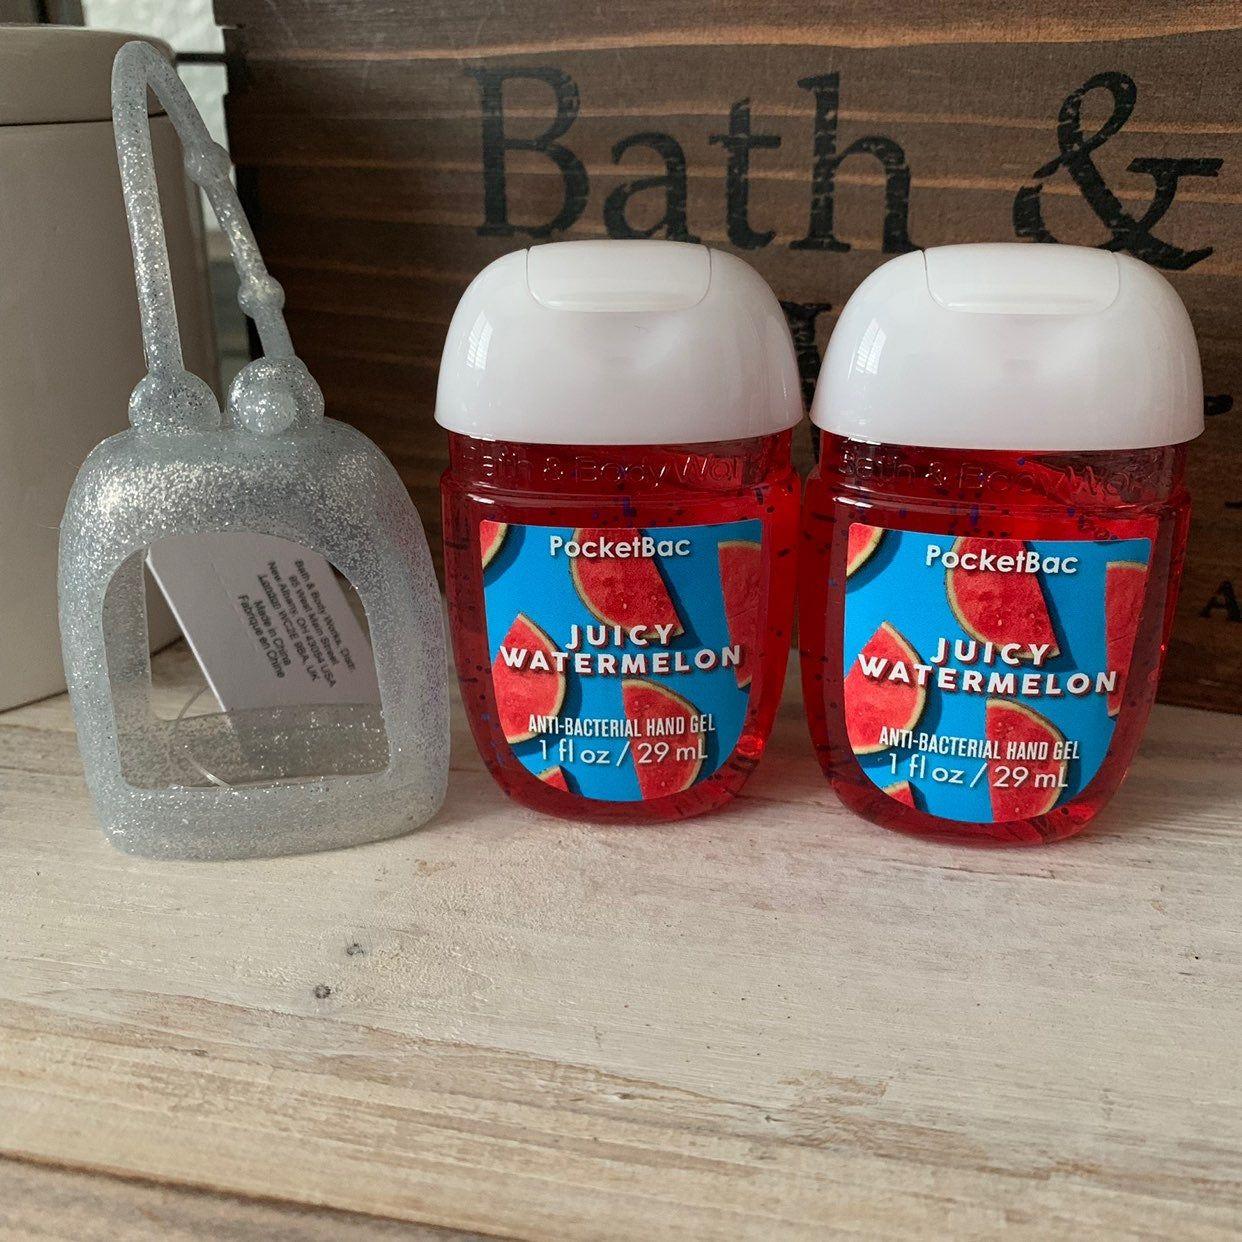 Bath Body Works 2019 Halloween Pocketbac Set Glittered Silicone